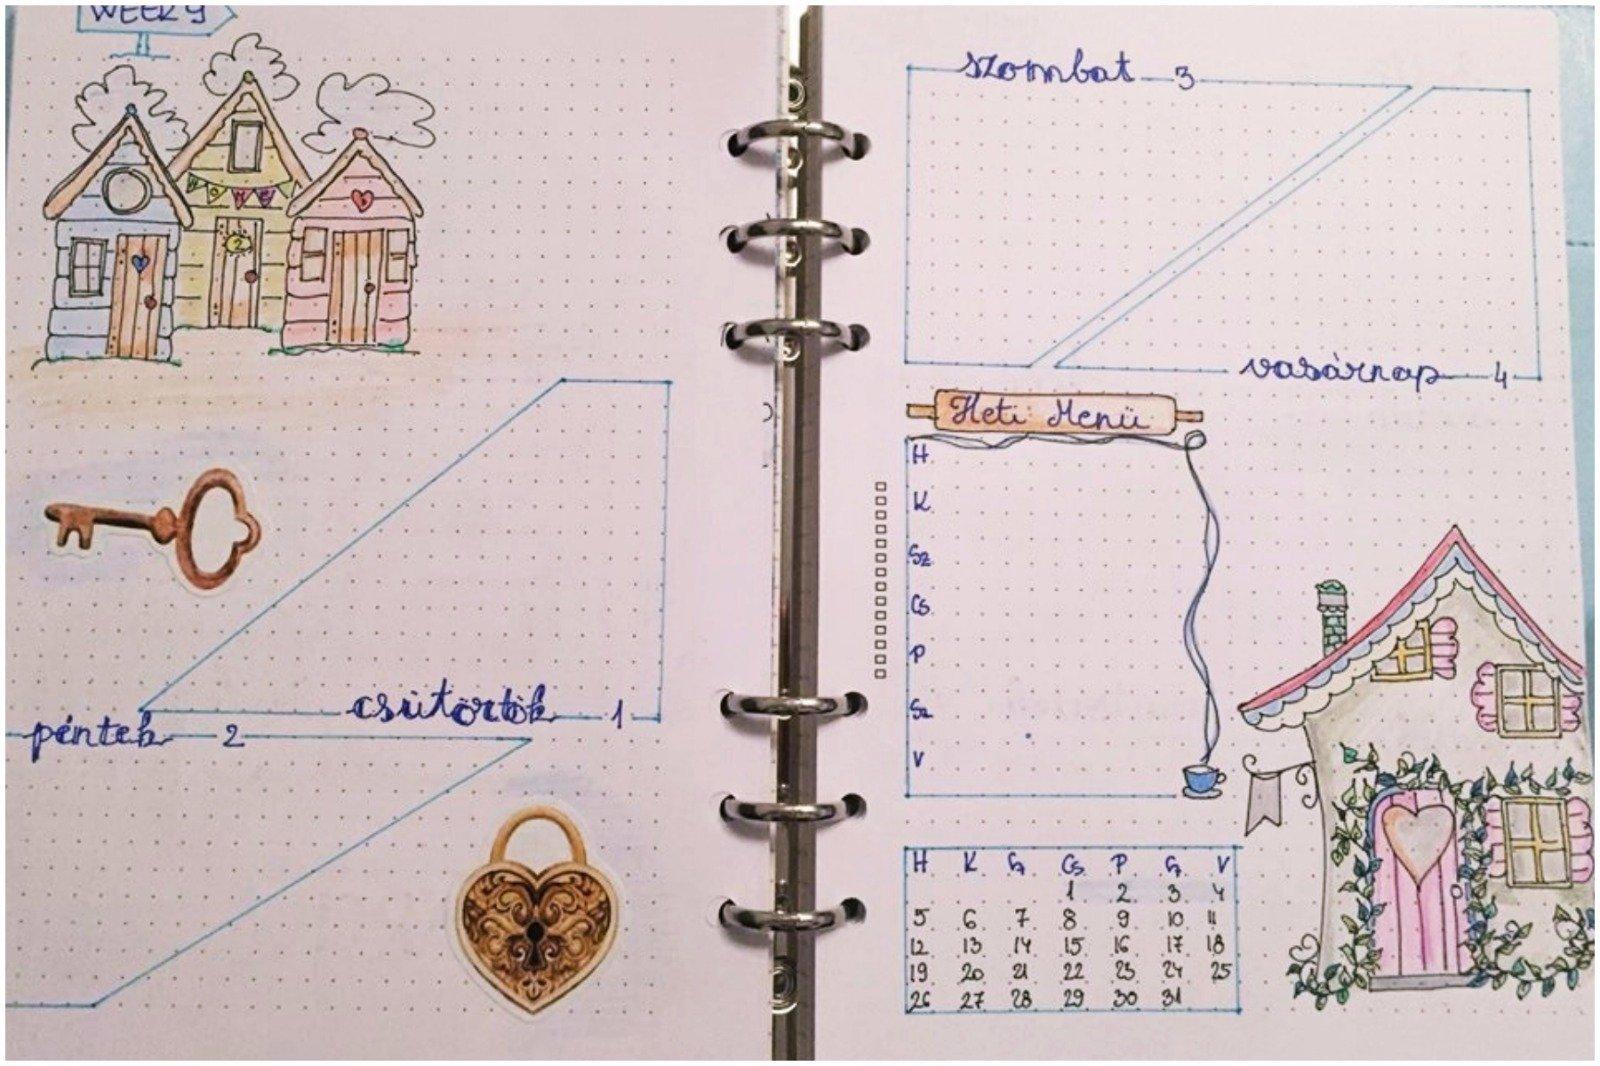 Bullet journal weekly planner - week 9 - itstartswithacoffee.com #march #coverpage #bulletjournal #bujo #weekly #weeklyplanner #bulletjournaling #bujojunkies #bujolove #showmeyourplanner #bujoinspire #bulletjournallove #bulletjournalcommunity #planning #planneraddict #bulletjournaljunkies #planwithme #itstartswithacoffee.com